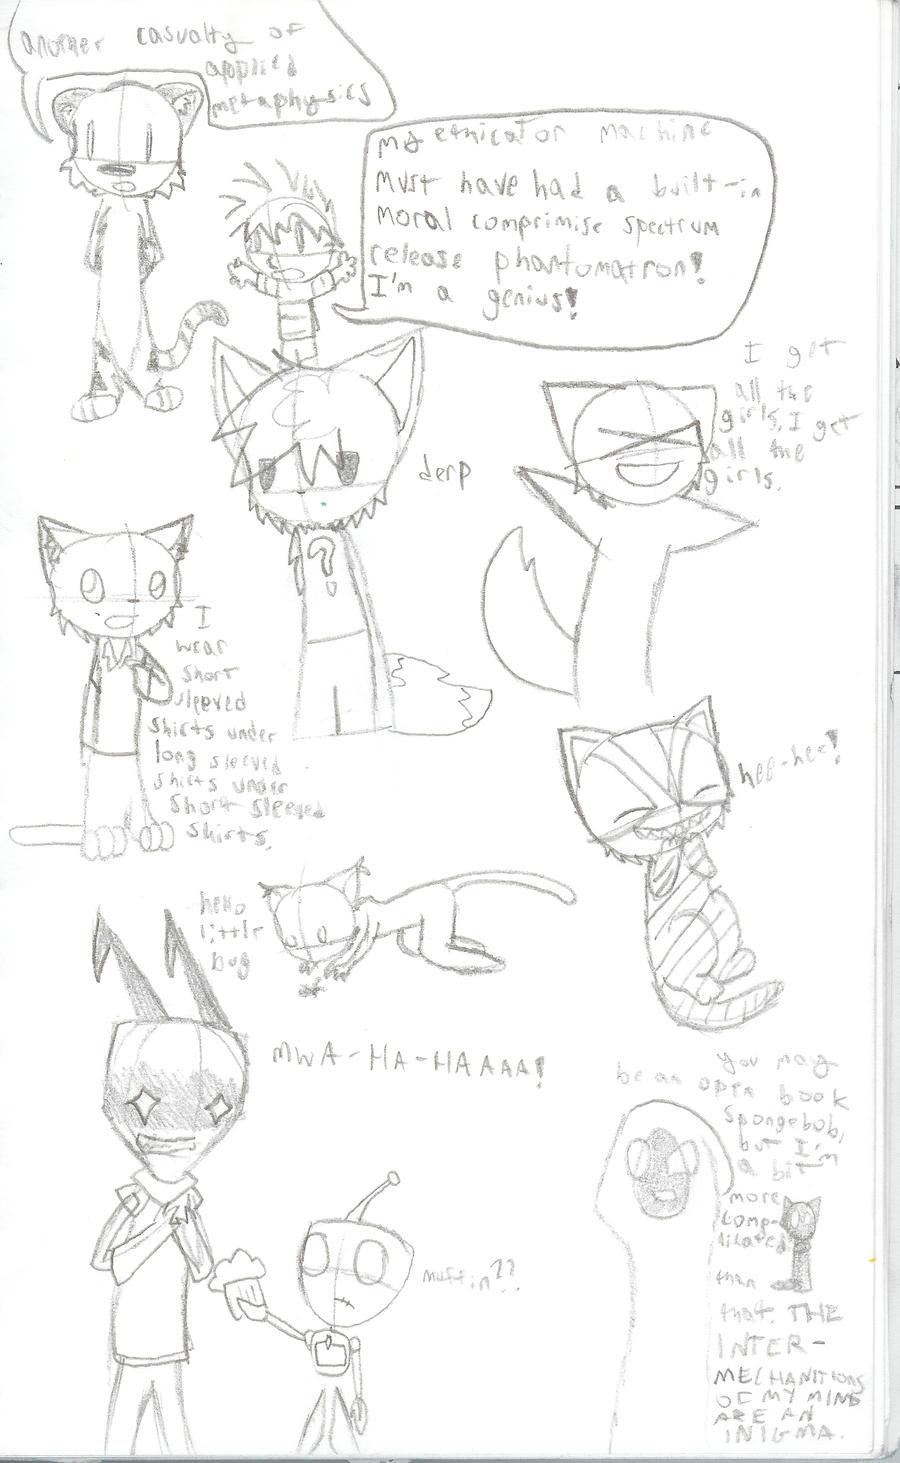 Doodle dump by SirCrashIII